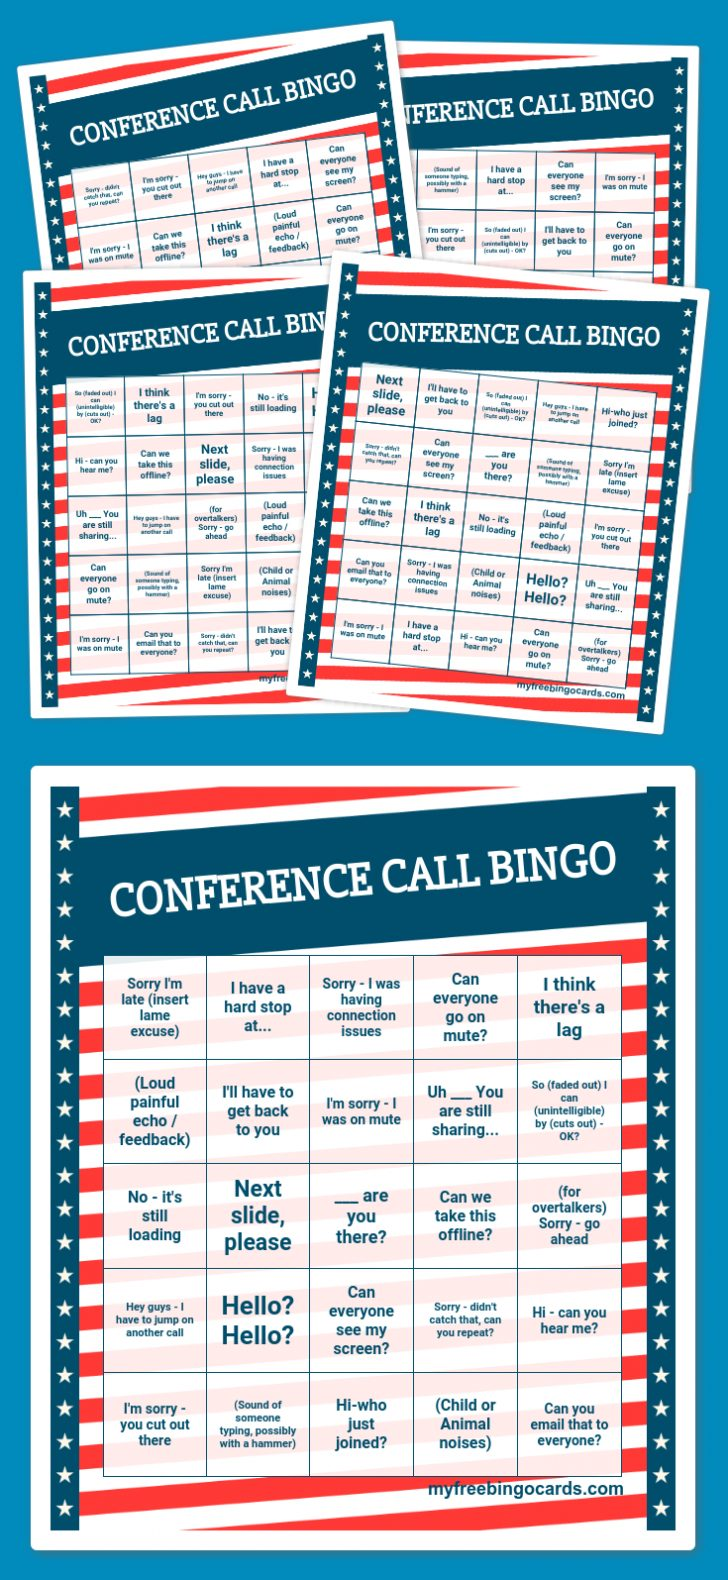 Printable Conference Call Bingo Cards